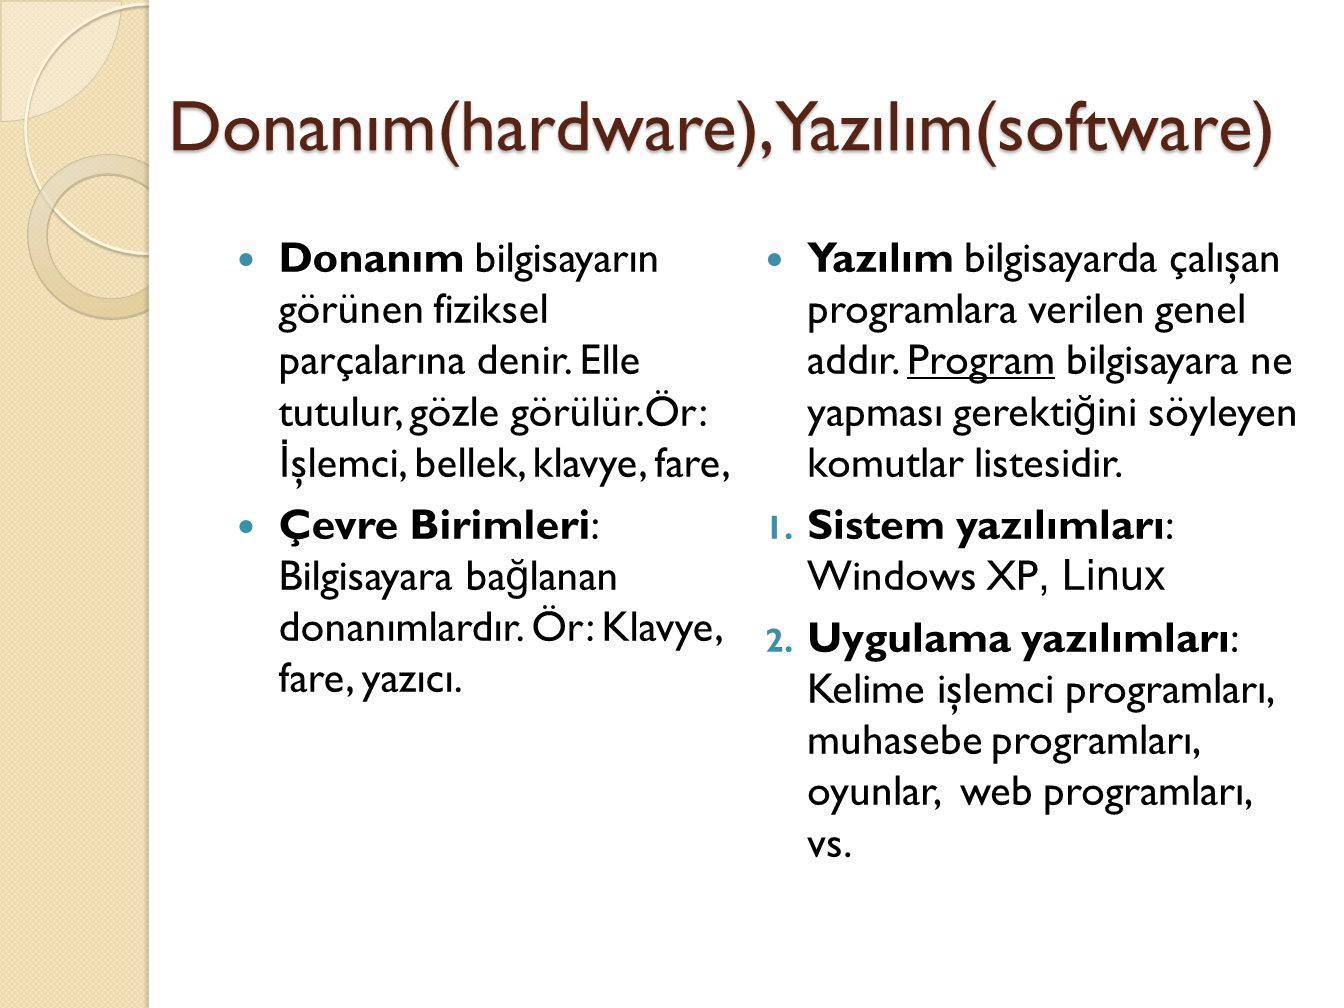 Donanım(hardware), Yazılım(software)